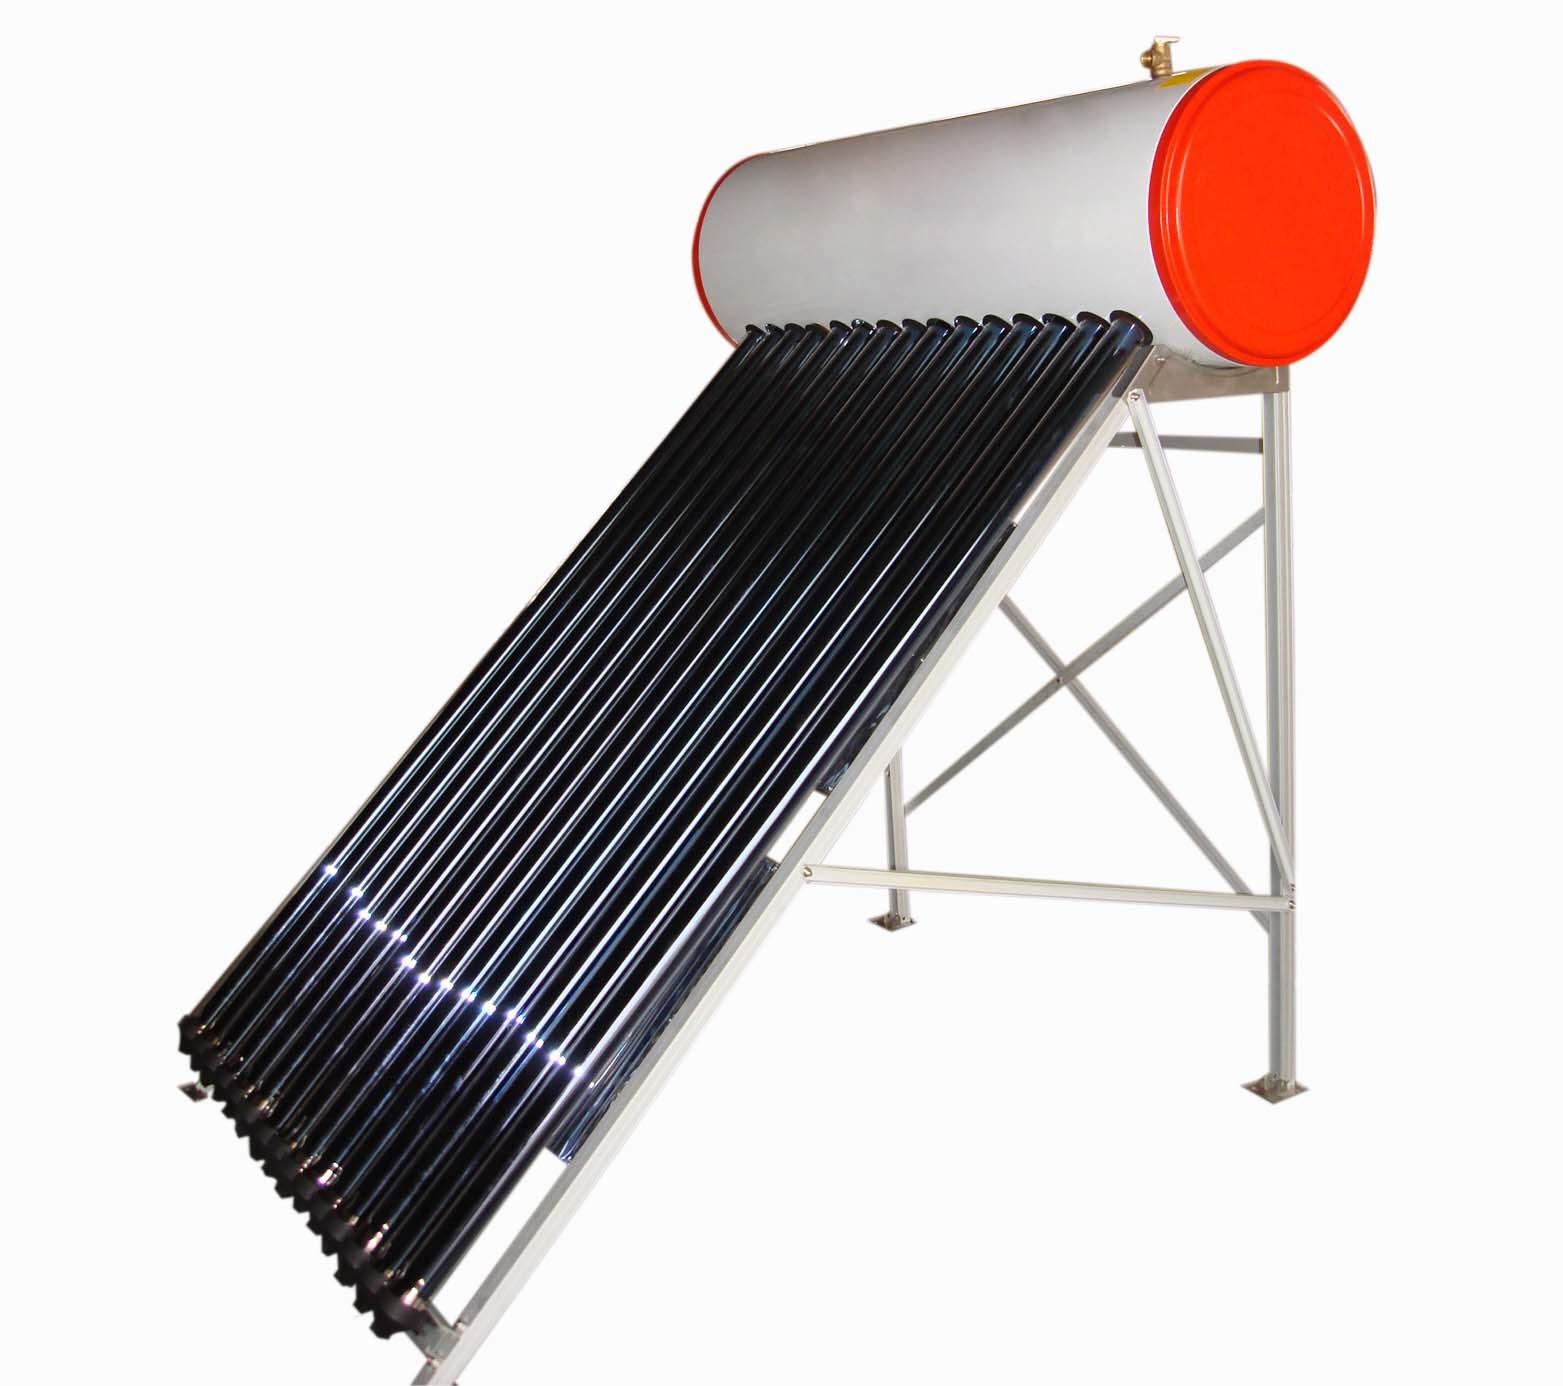 Low Pressure Homemade Solar Panels